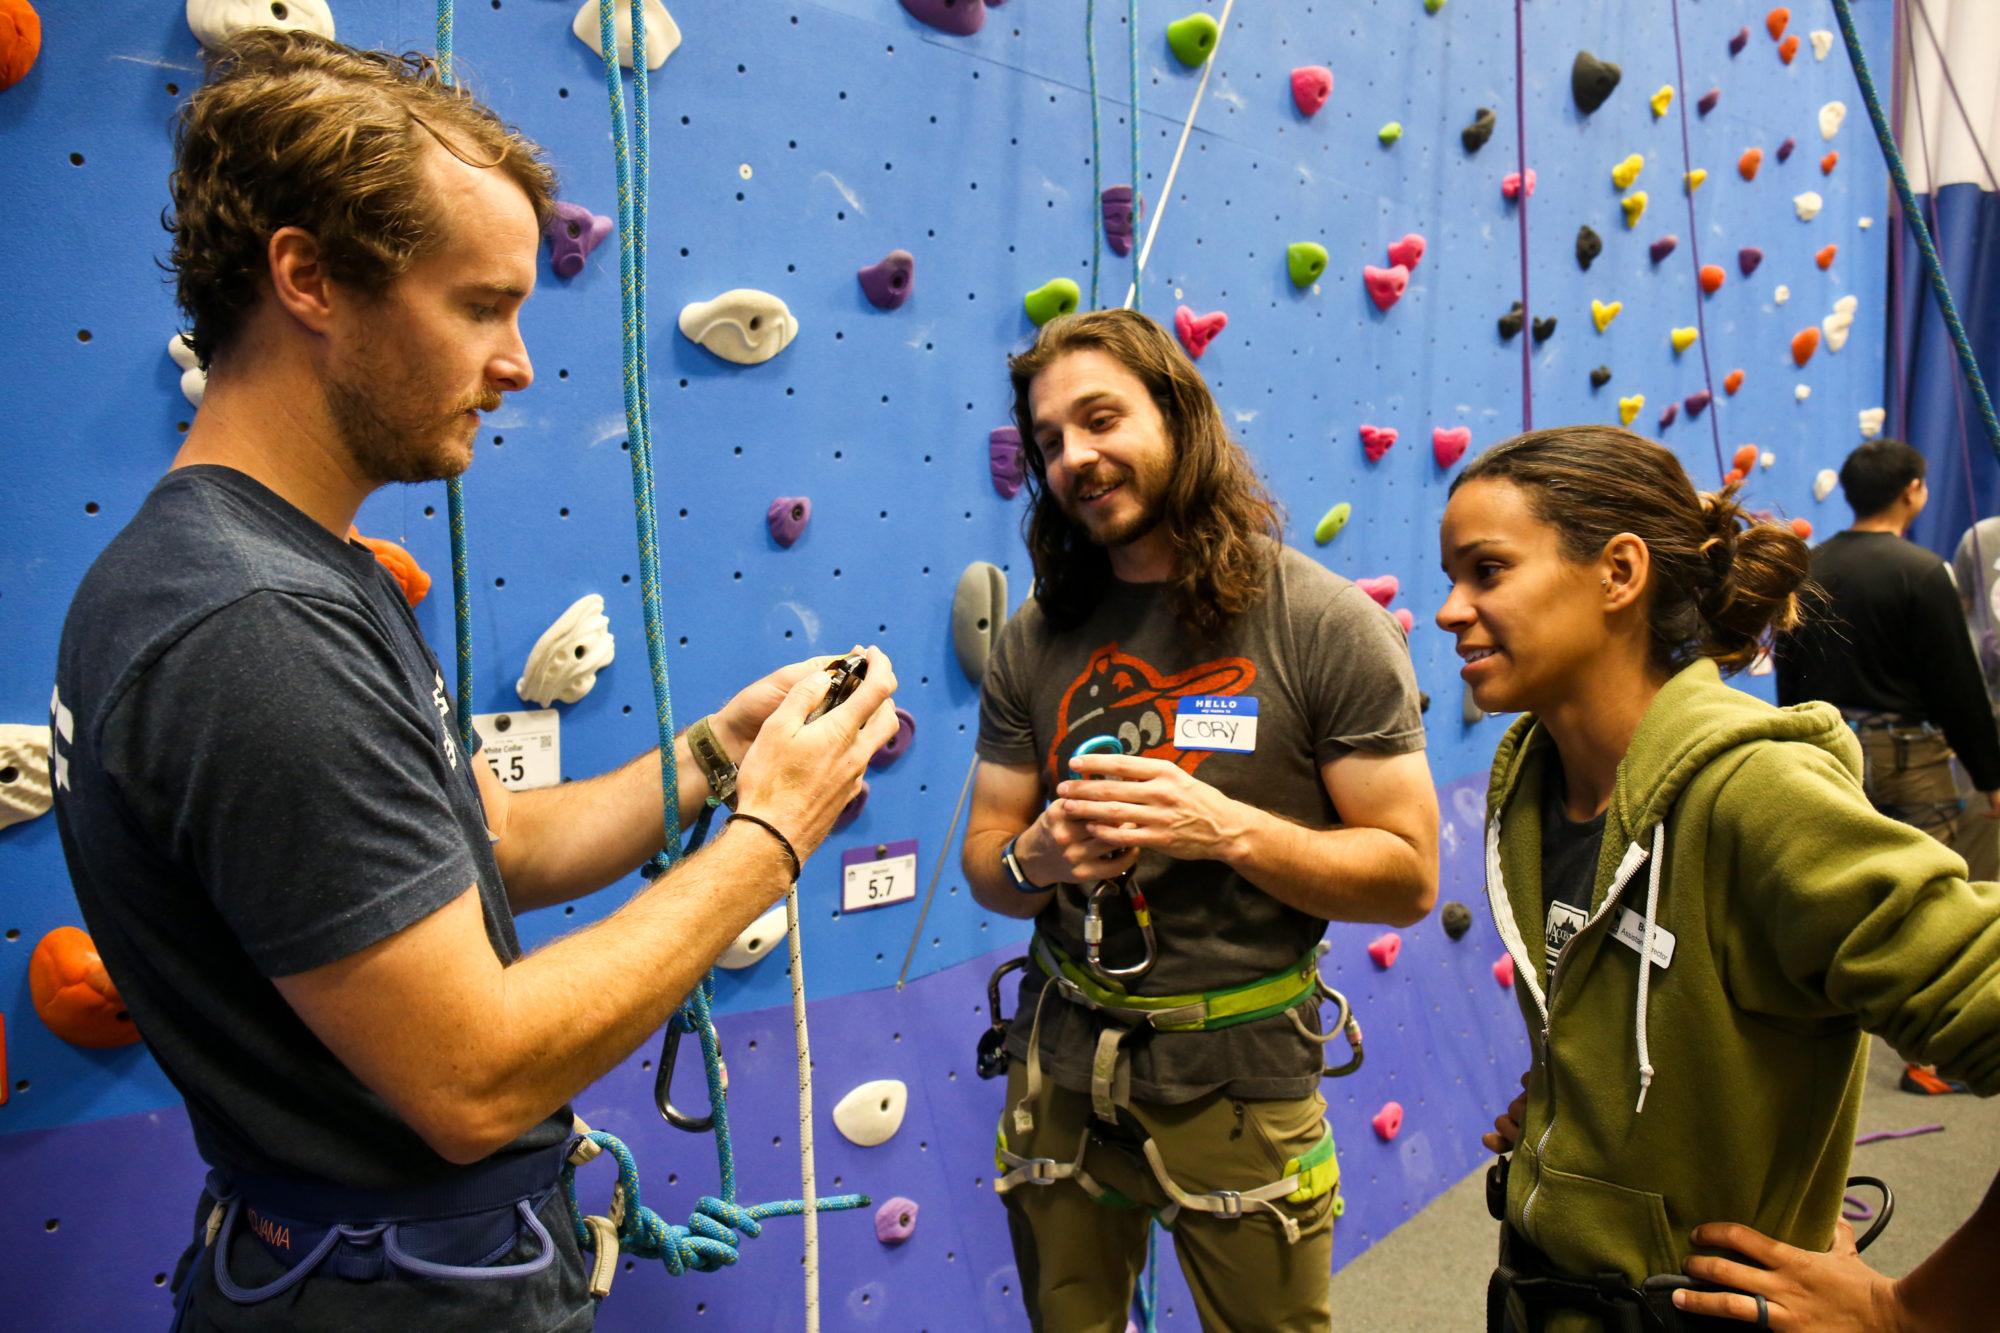 Learning knots at the ACI Course at Earth Treks in Arlington, VA